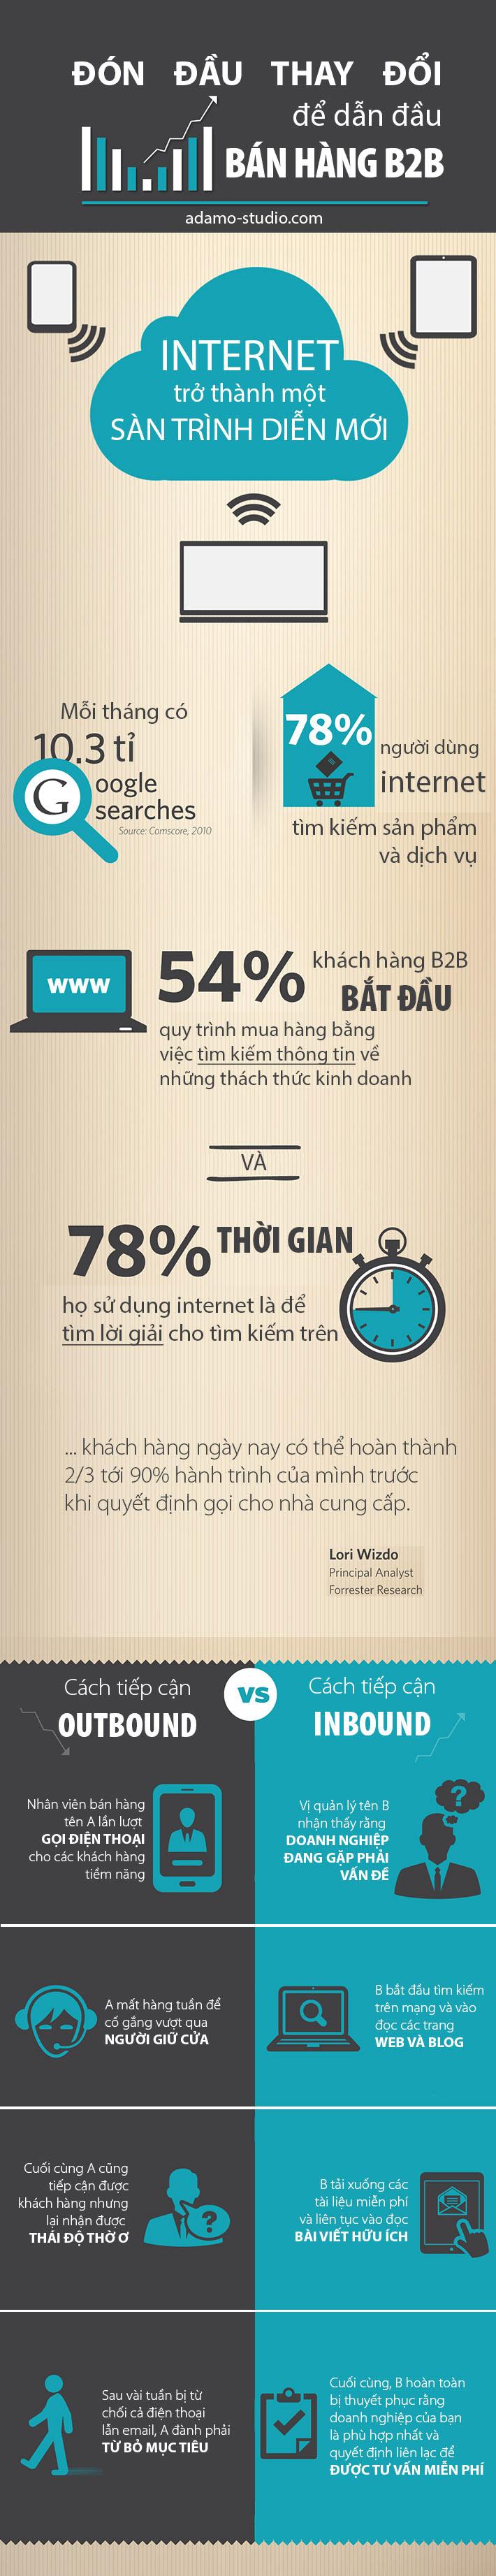 Ban-hang-B2B-infographic-adamo-studio-1